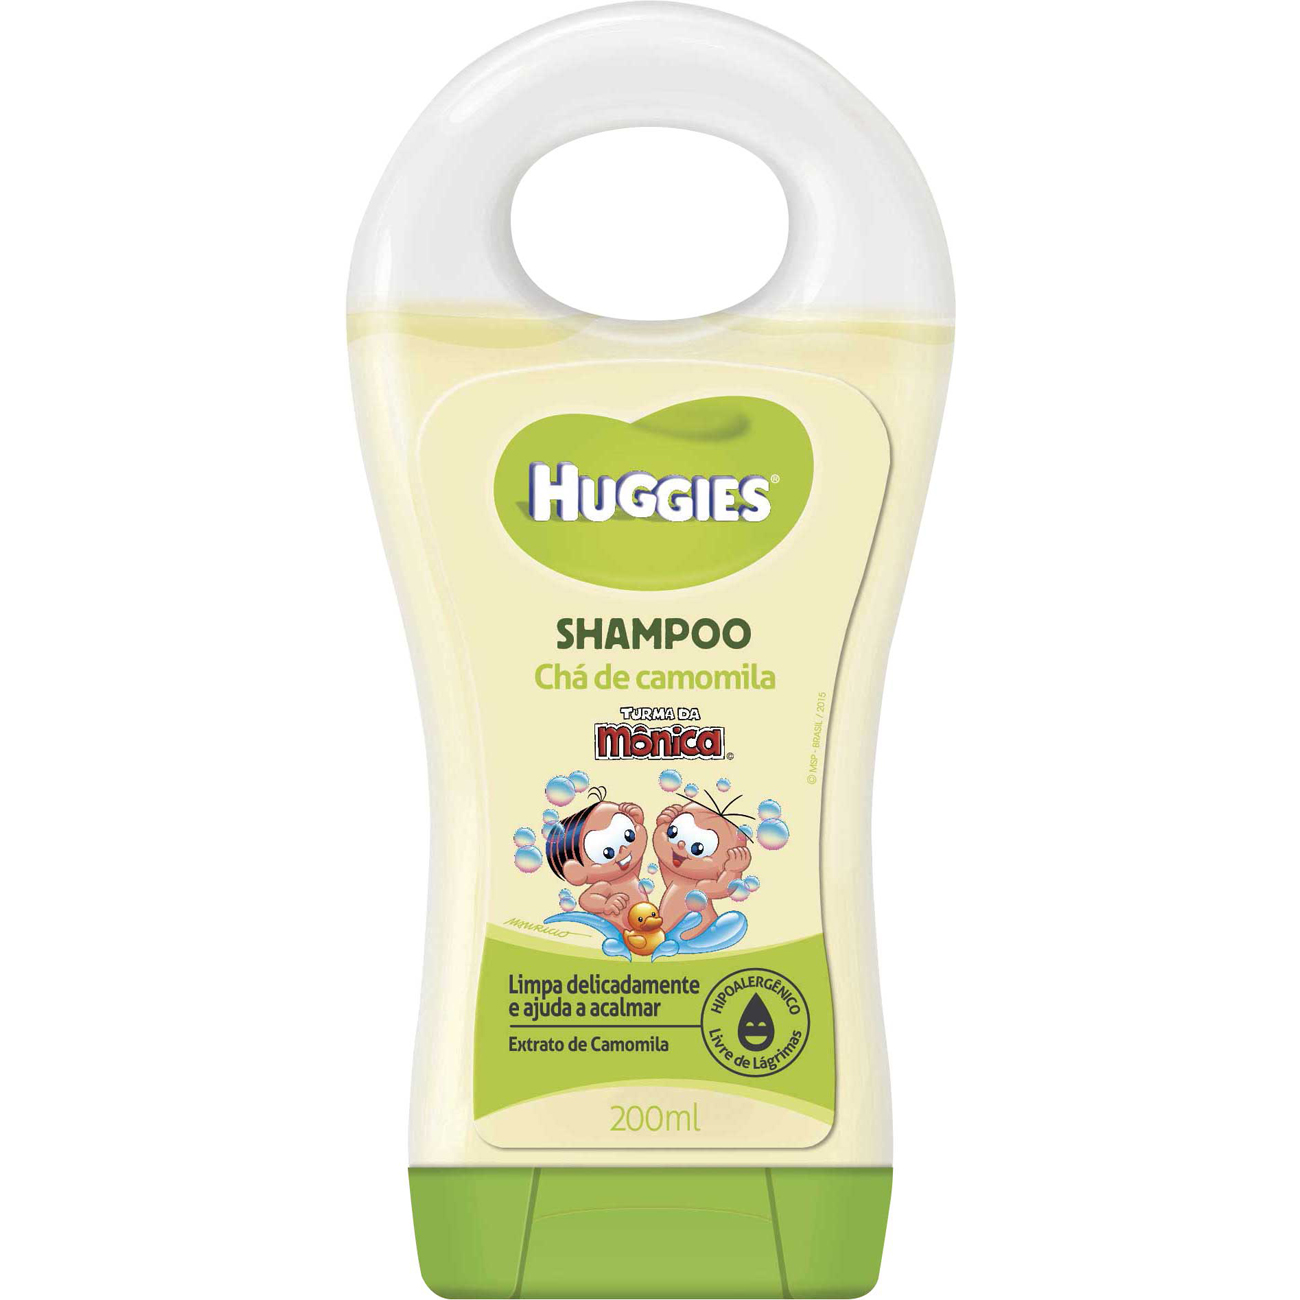 Shampoo Turma Monica Huggies 200Ml Camomila